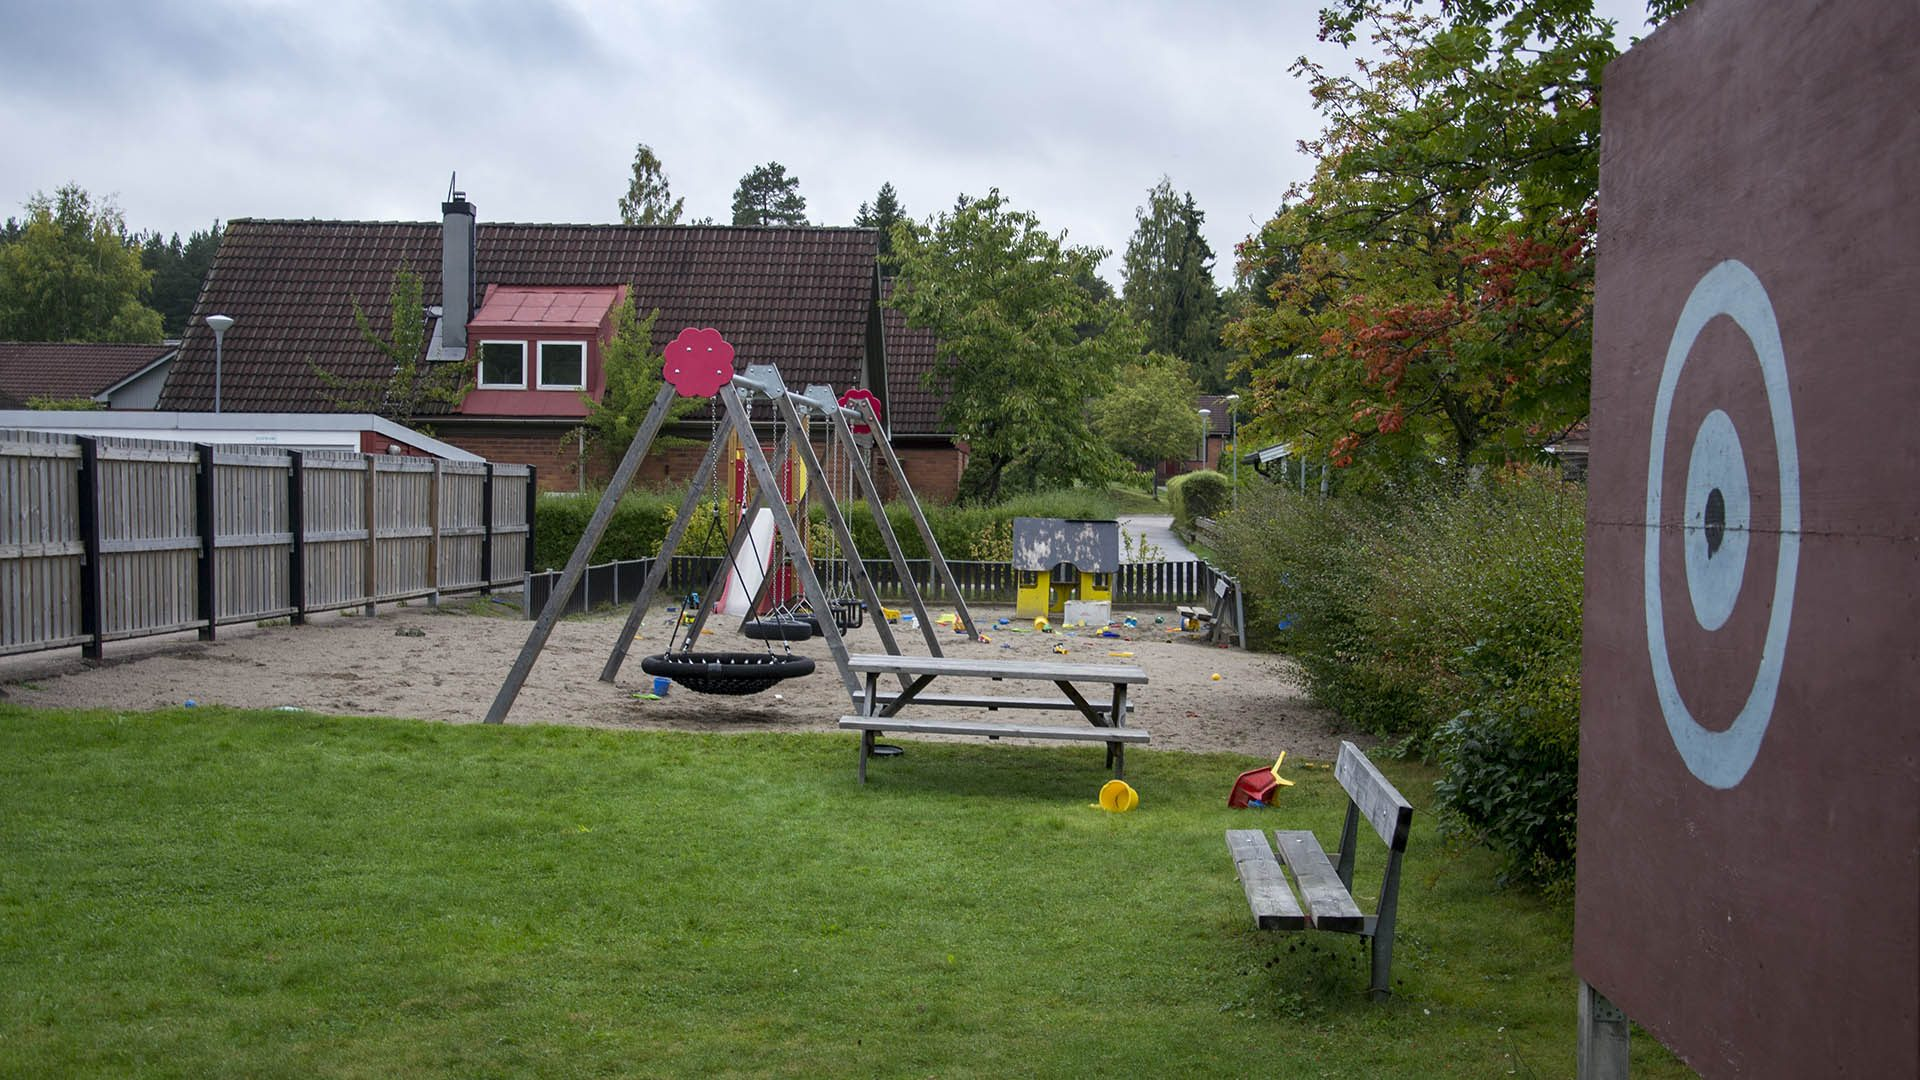 Arka pedagogisk omsorg